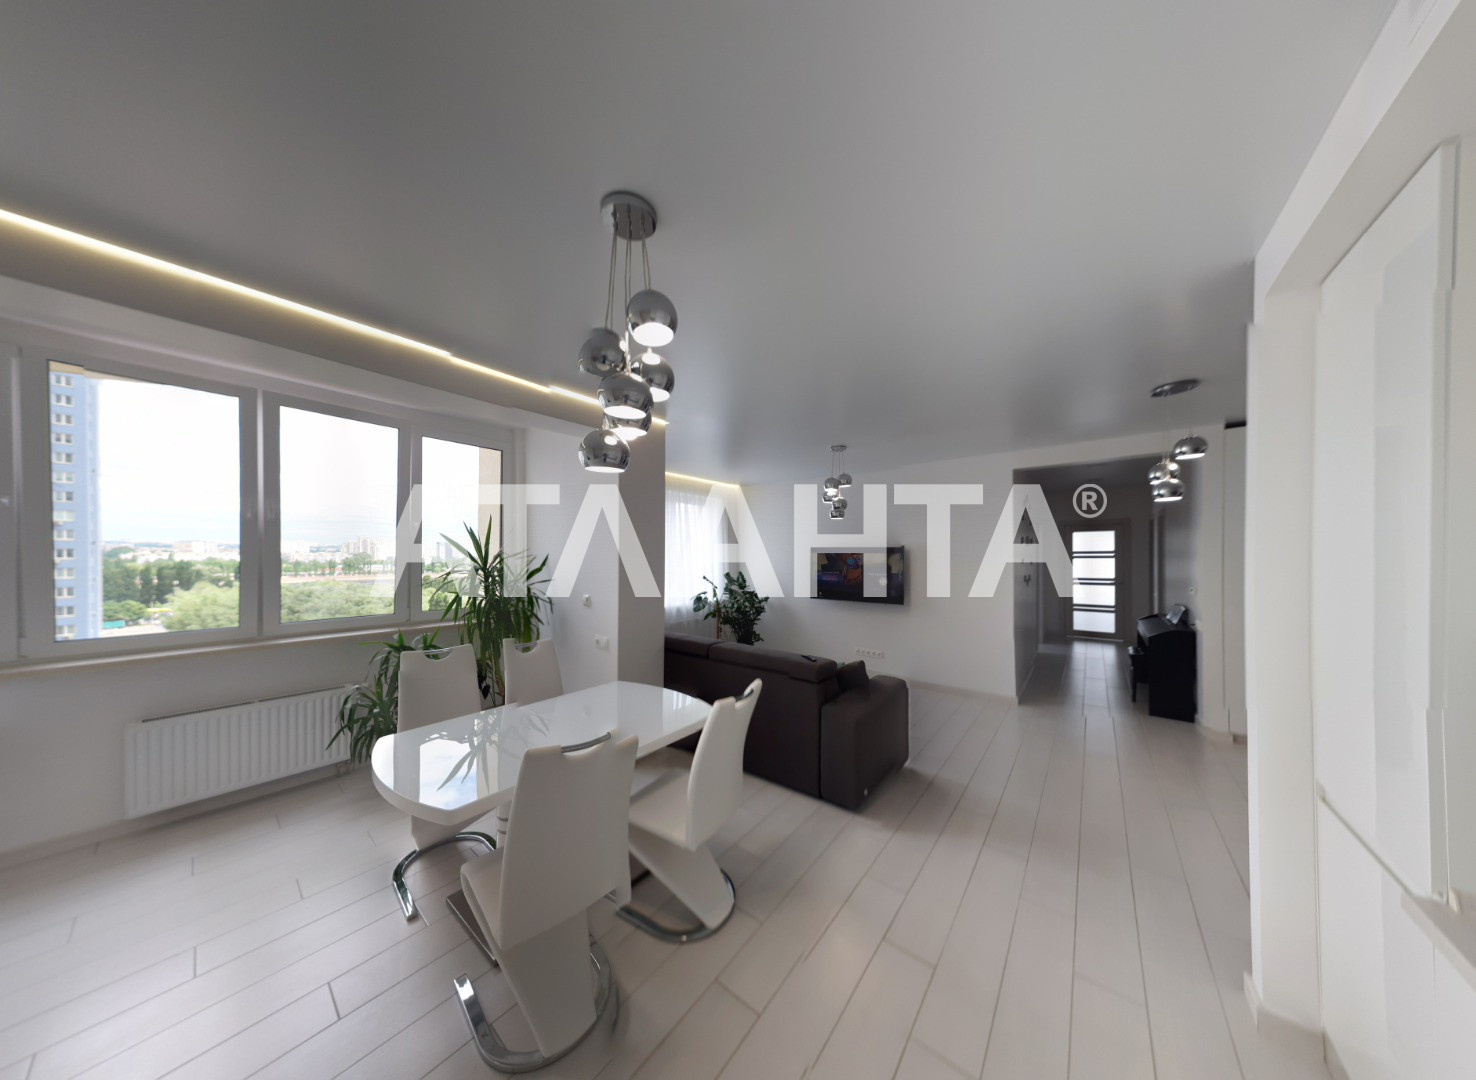 Продается 3-комнатная Квартира на ул. Просп. Глушкова — 160 000 у.е. (фото №26)